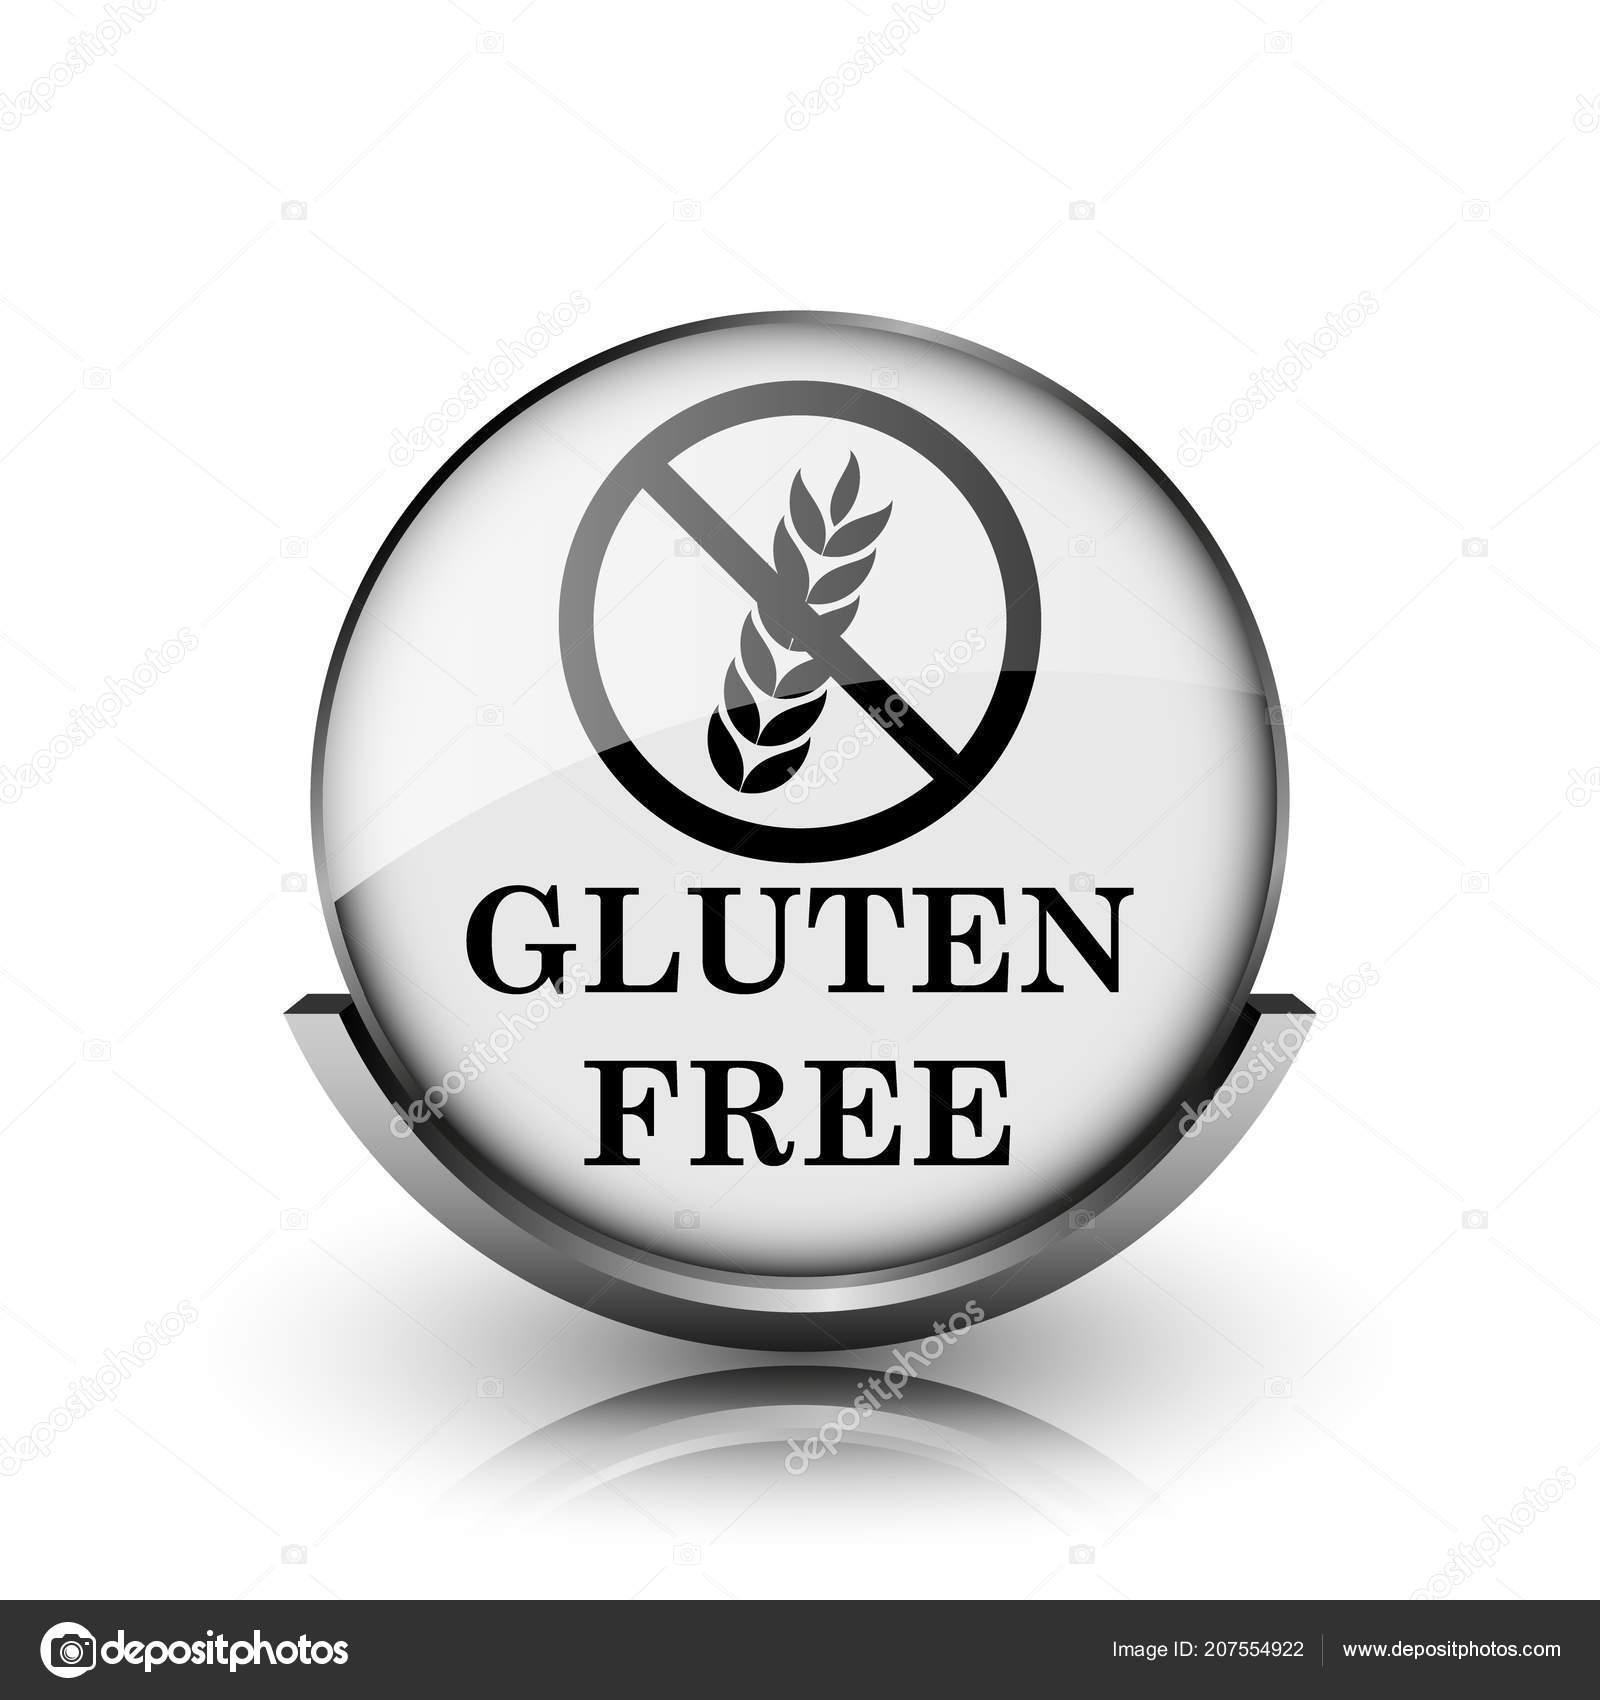 Gluten free icon — Stock Photo © valentint #207554922